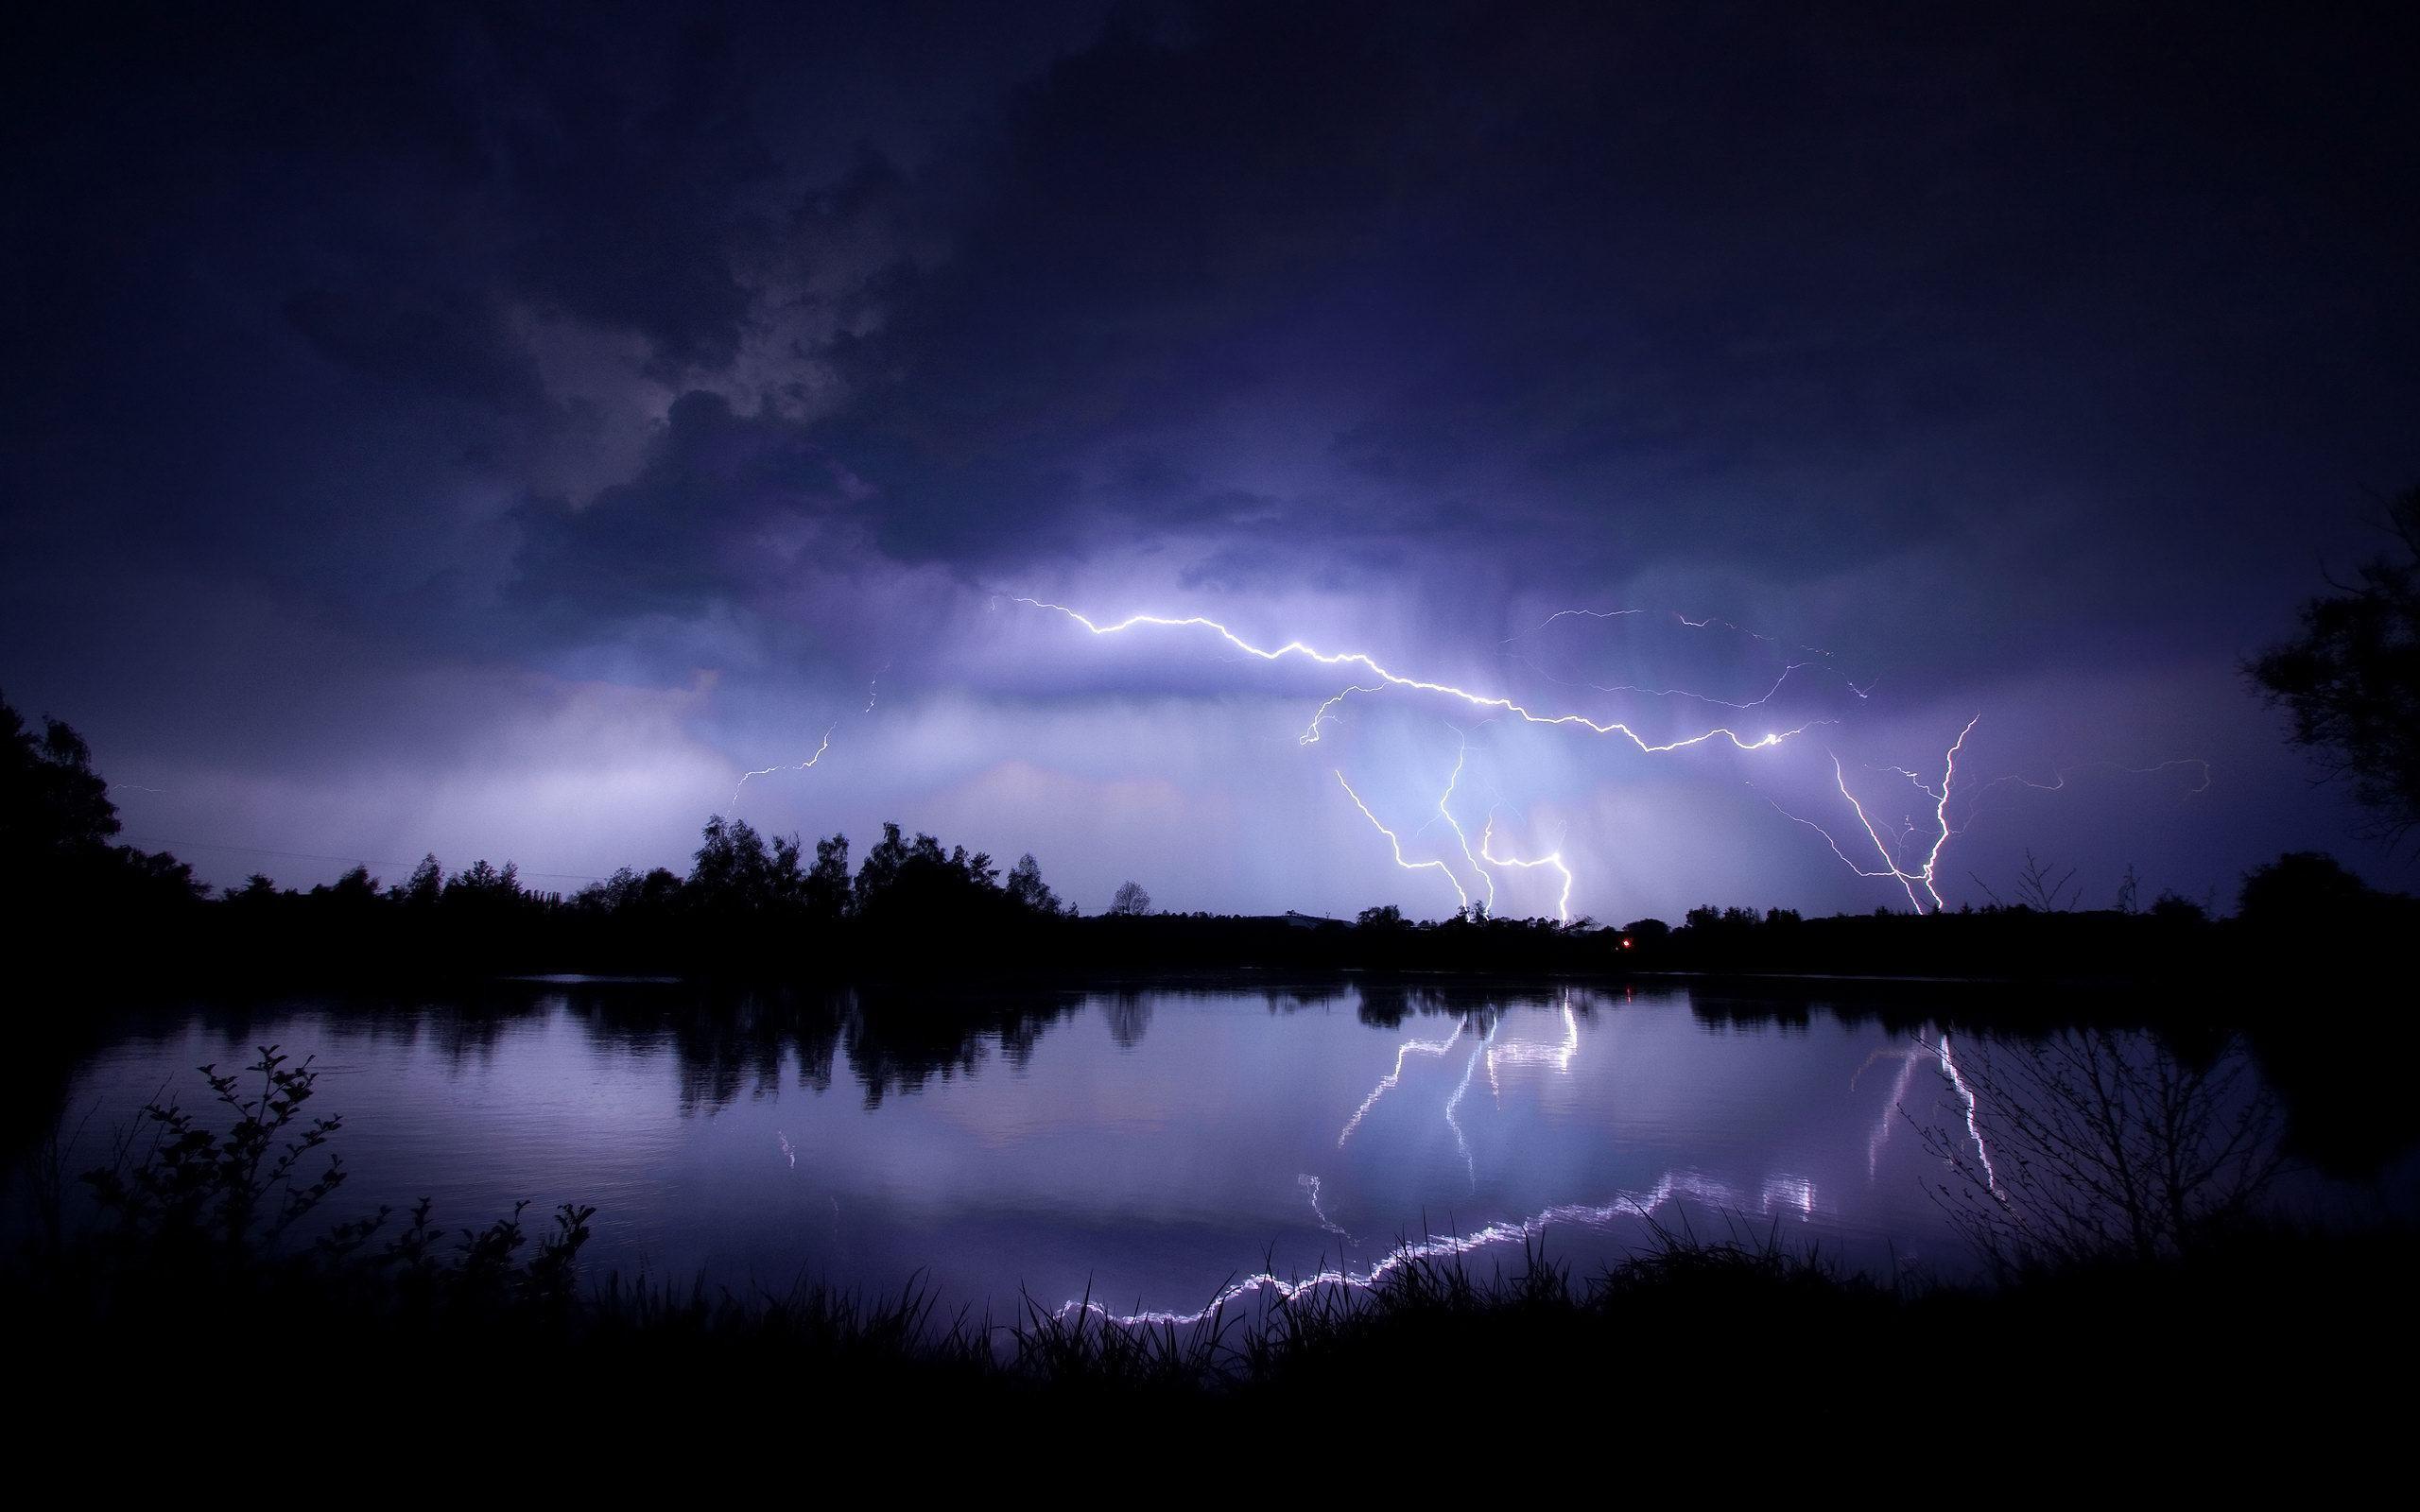 Lightning-striking-the-lakeside-night-storm-nature-hd-